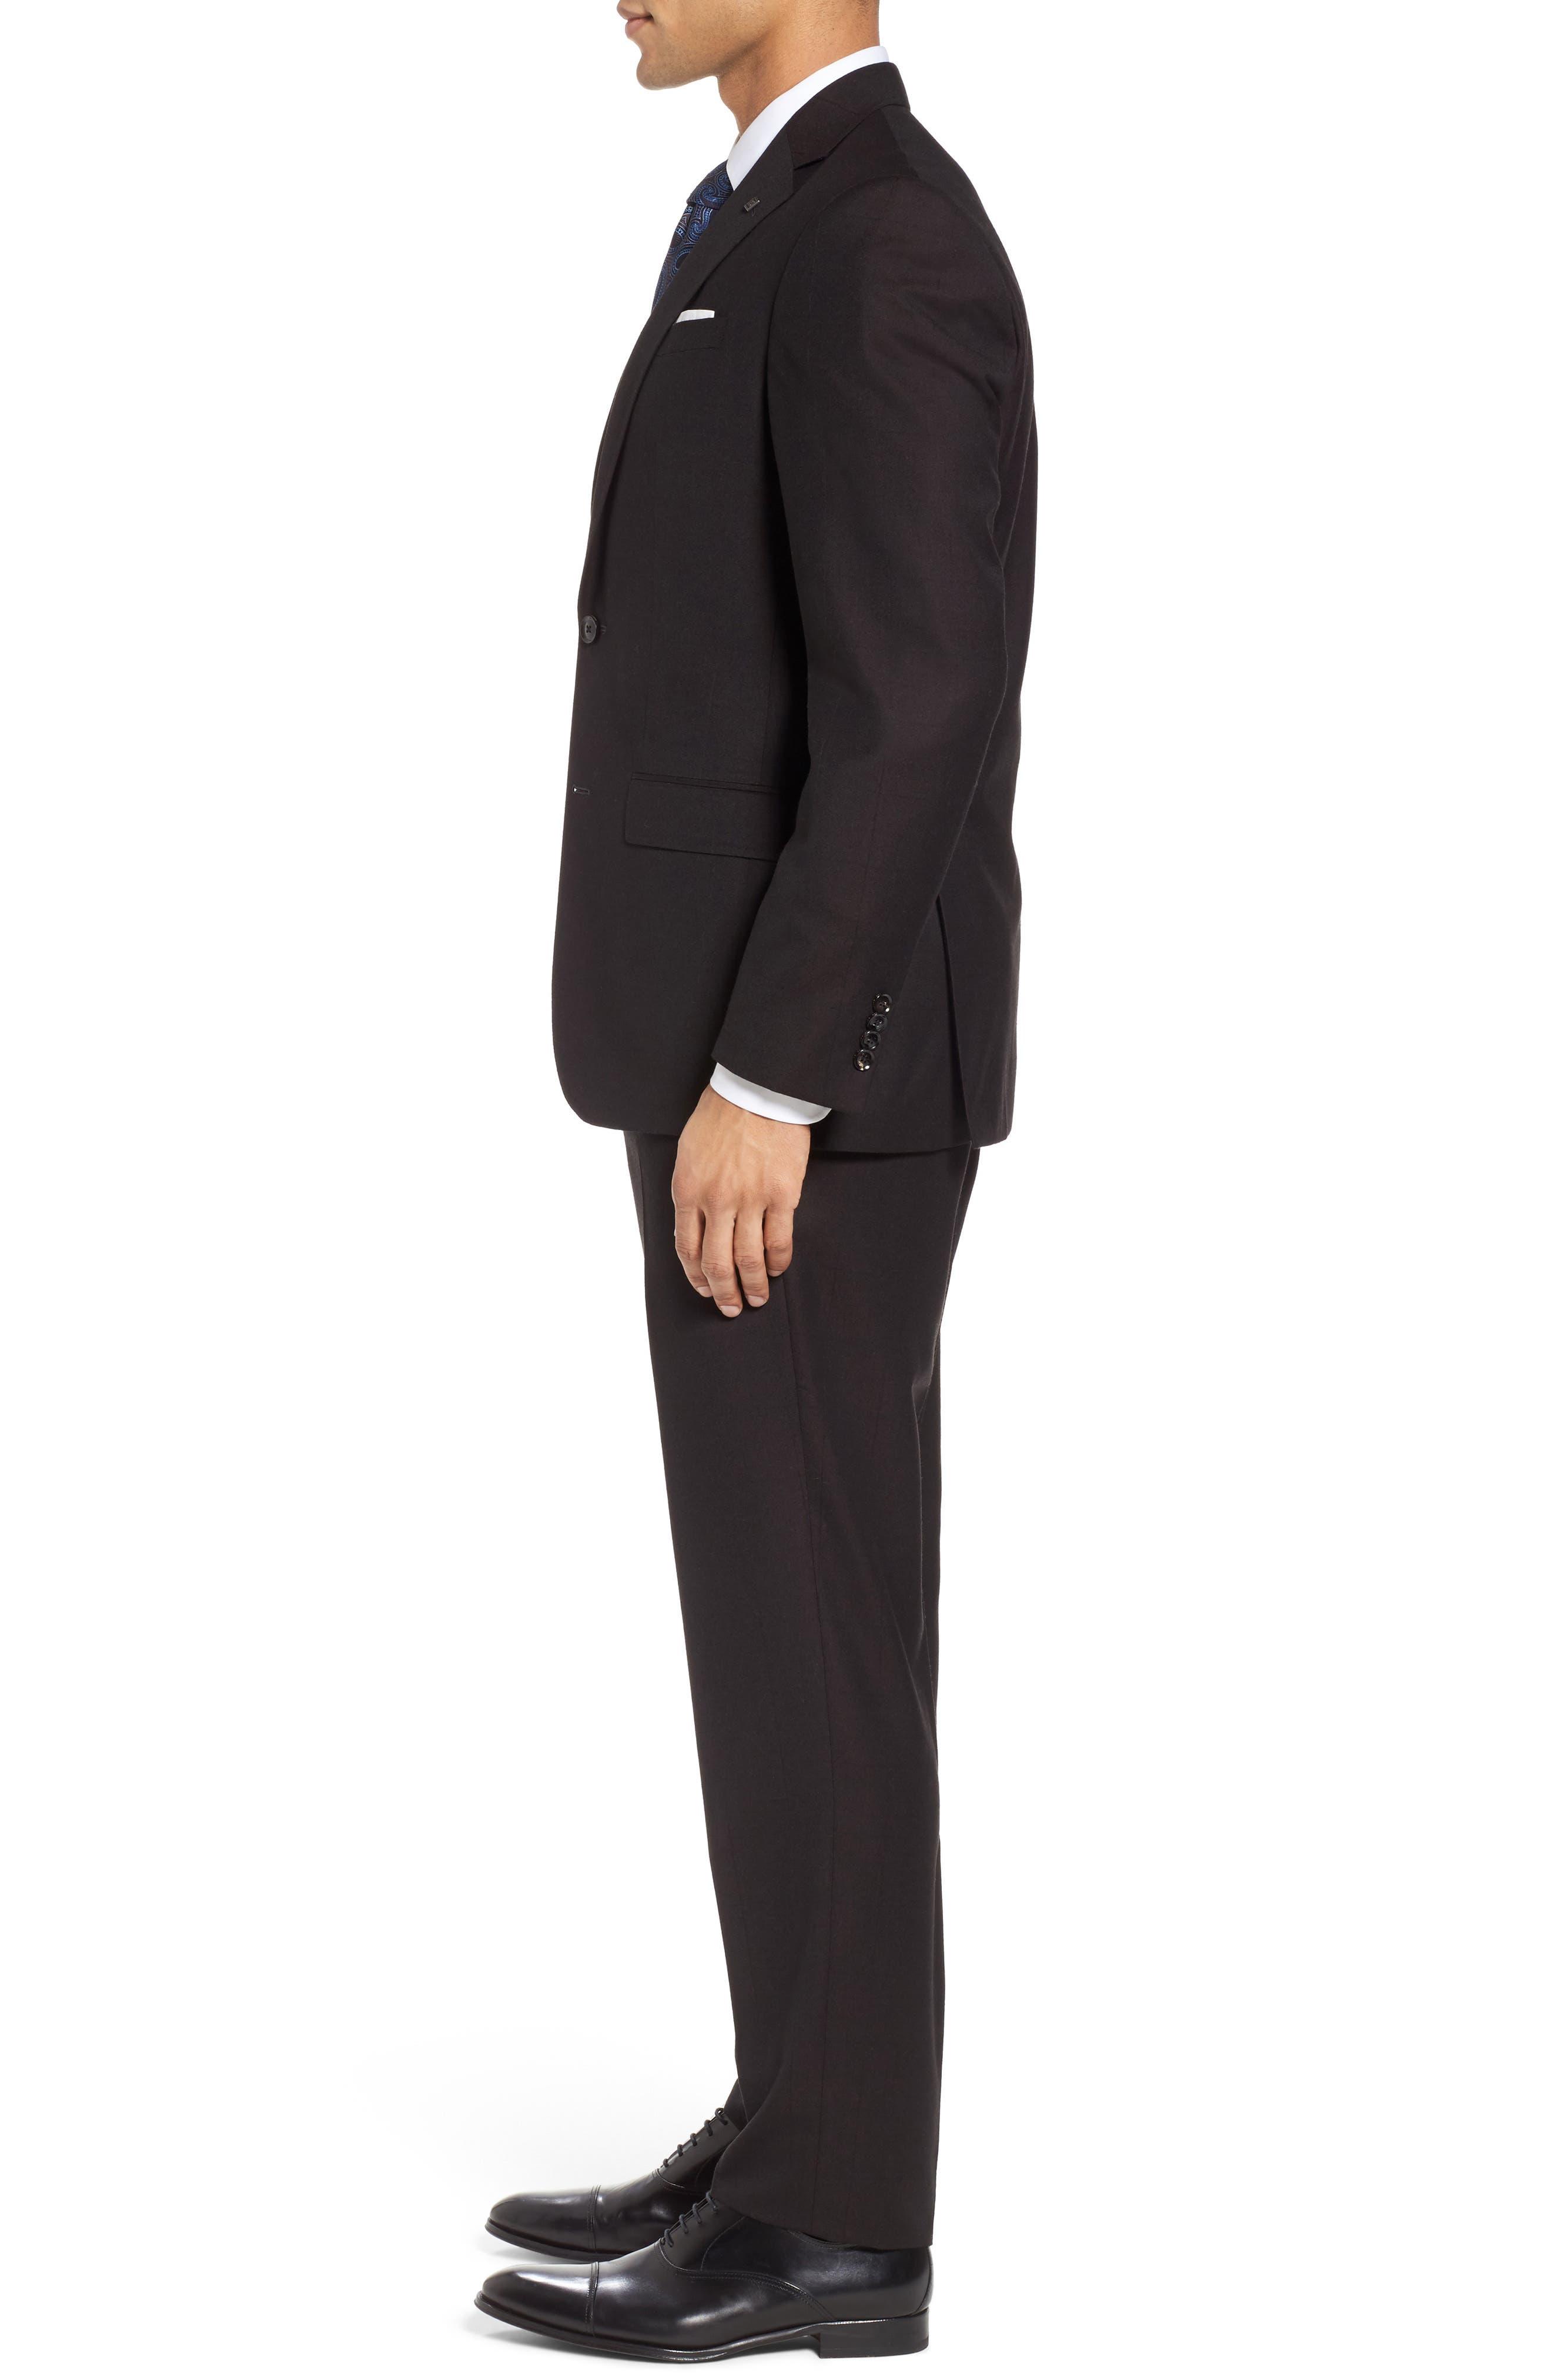 Jay Trim Fit Solid Wool Suit,                             Alternate thumbnail 3, color,                             200